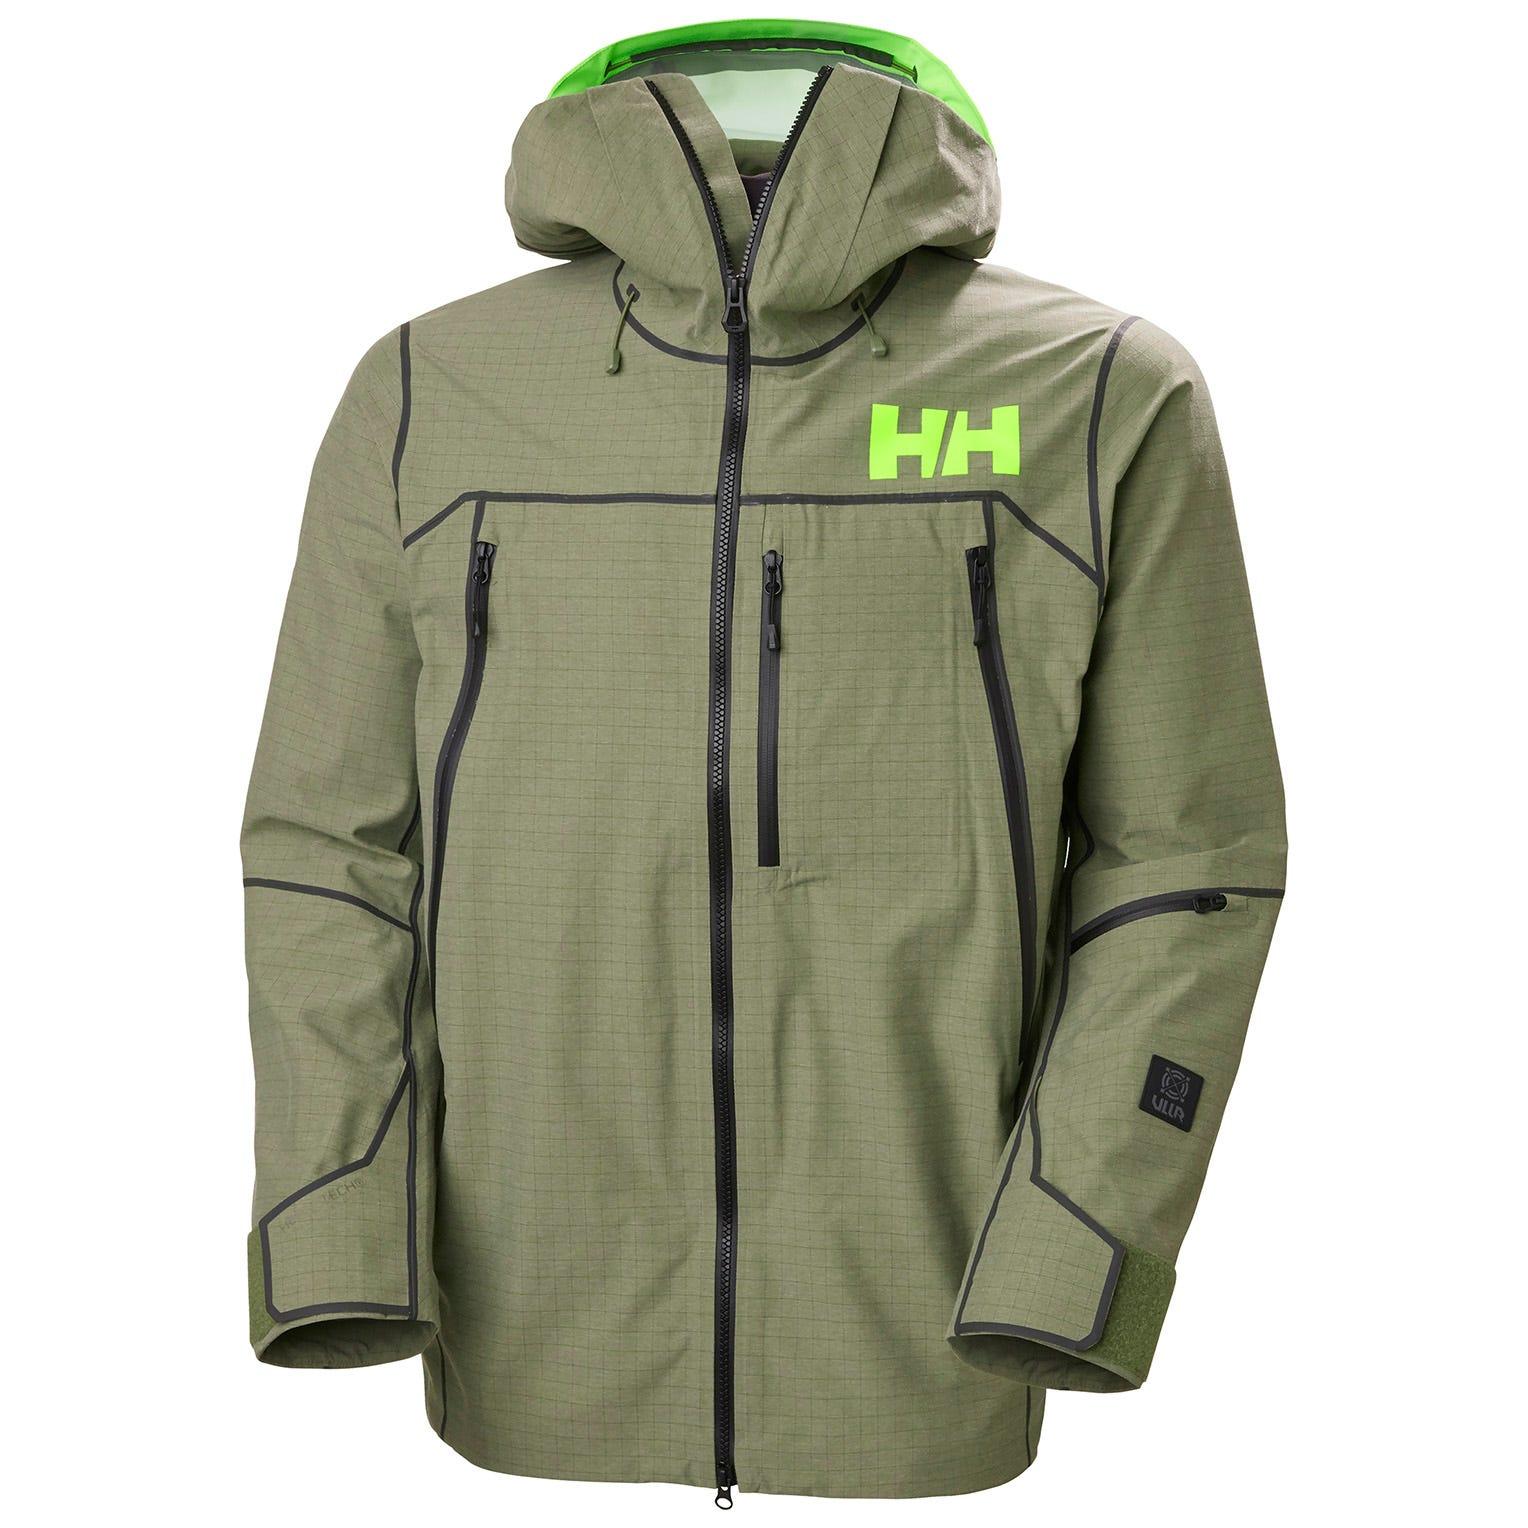 Helly Hansen Mens Elevation Shell 3.0 Mountain Ski Jacket Green XL